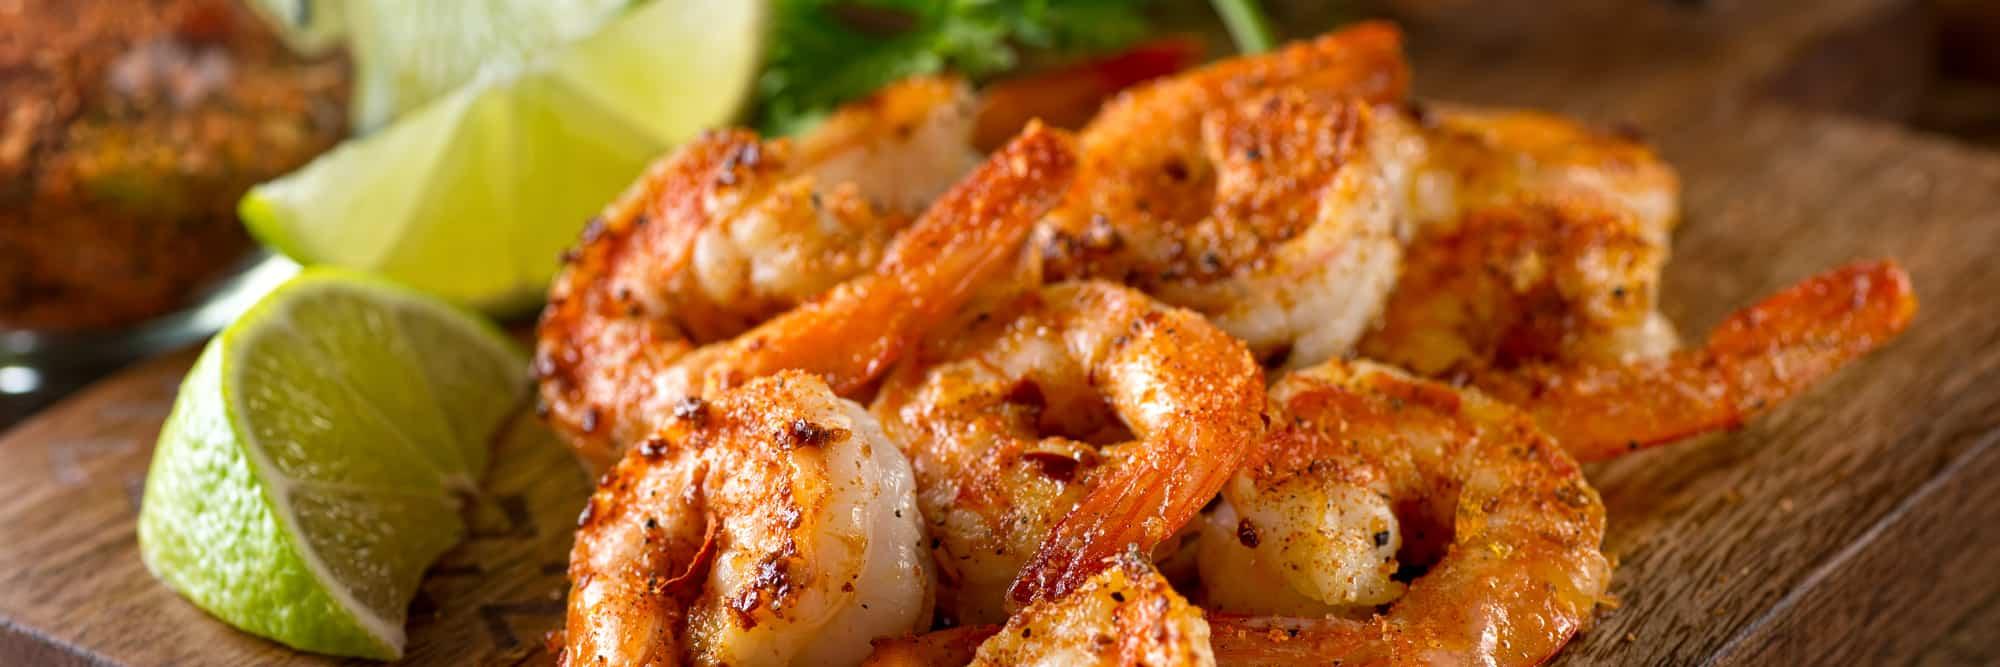 Taste Catering Menus Shrimp Entree